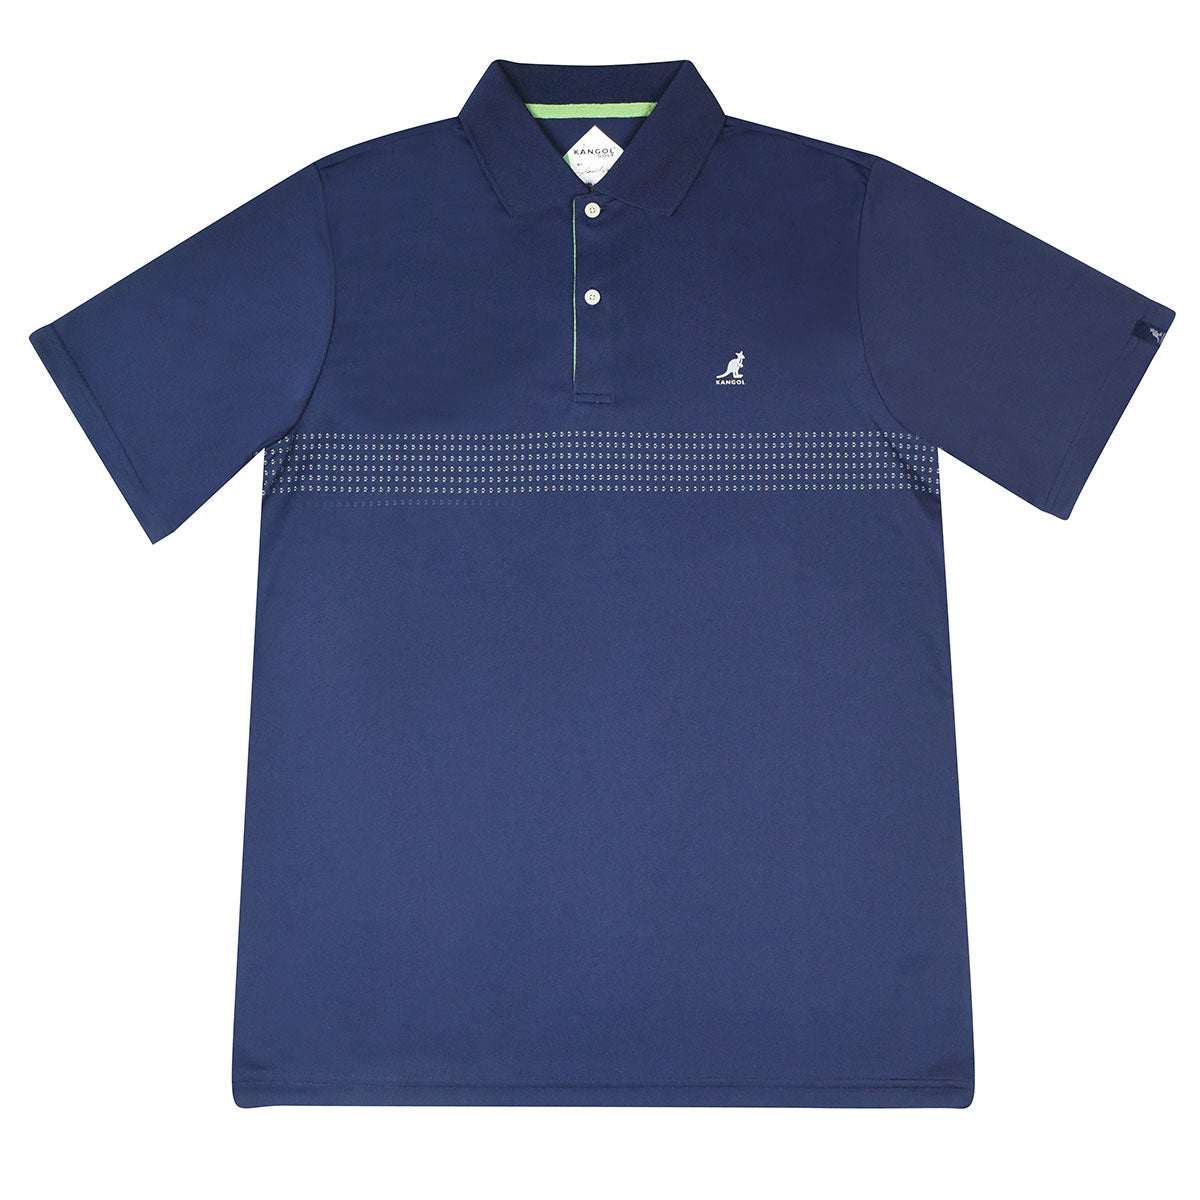 Kangol Samuel L. Jackson Golf Ventair Polo Shirt in Navy